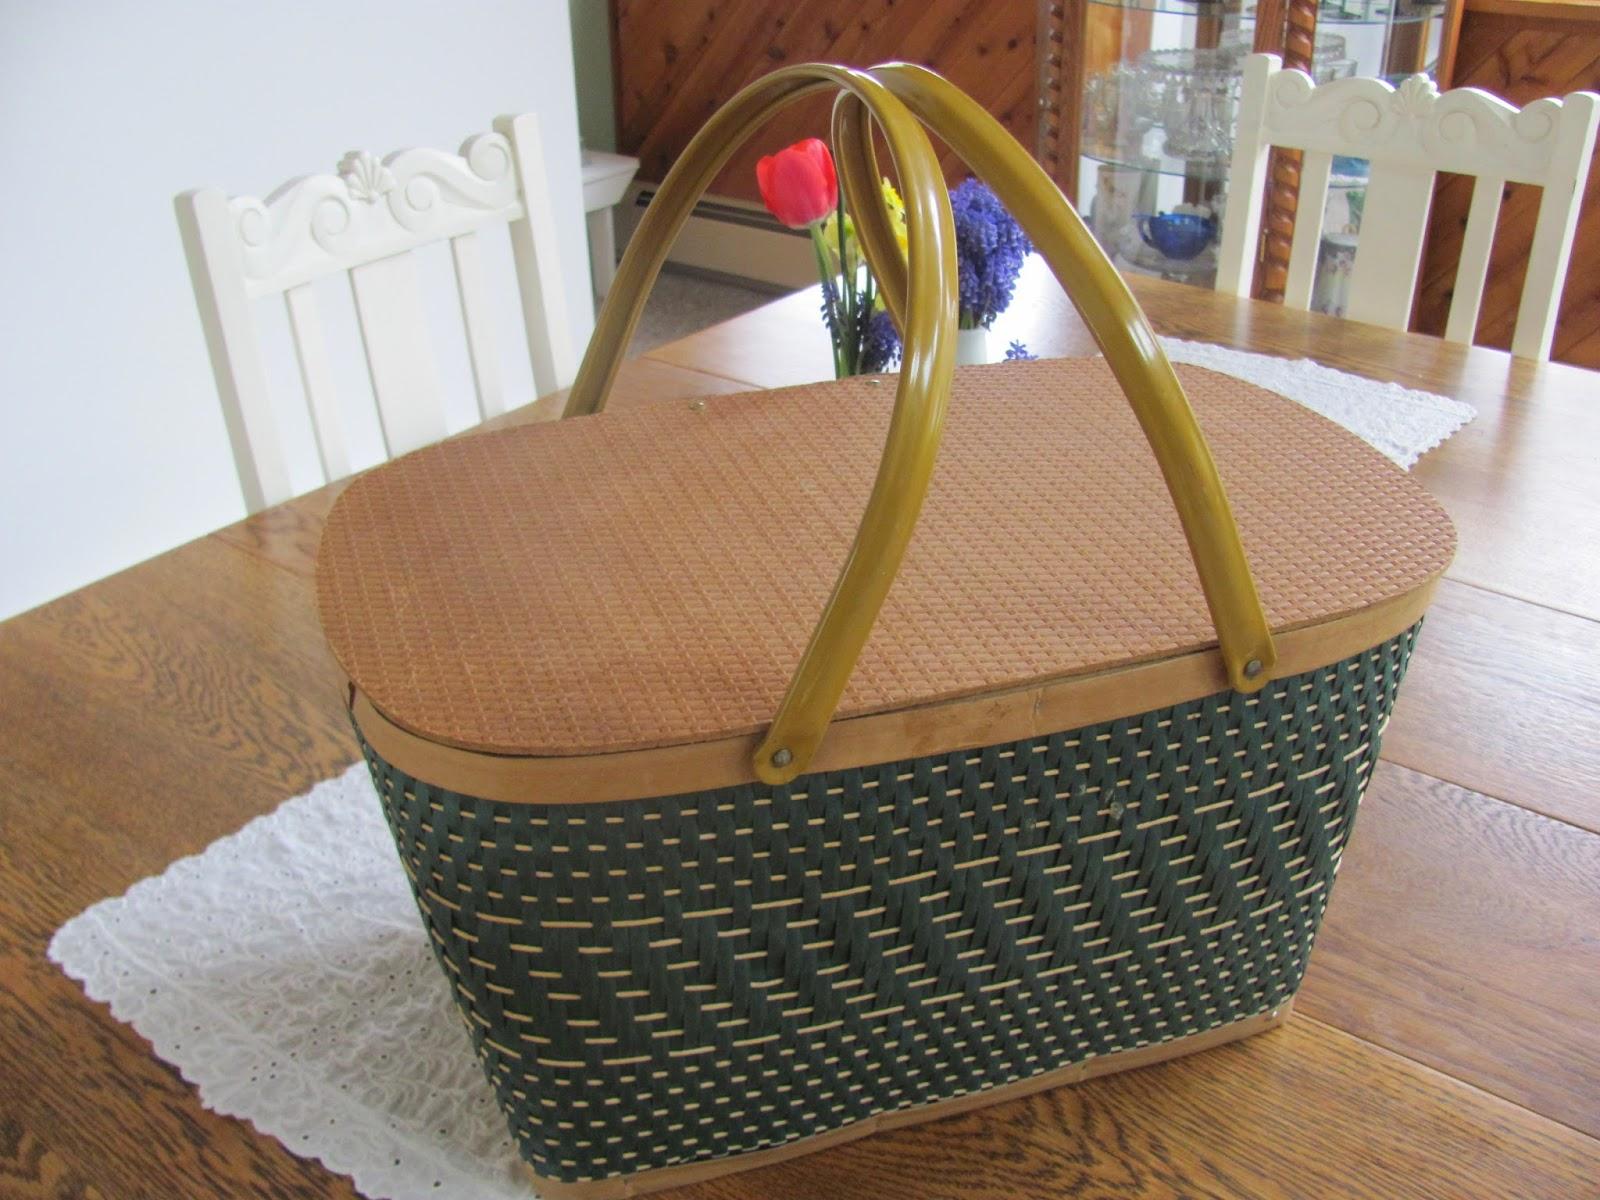 Picnic Basket Spotlight : My shabby chateau vintage picnic basket makeover